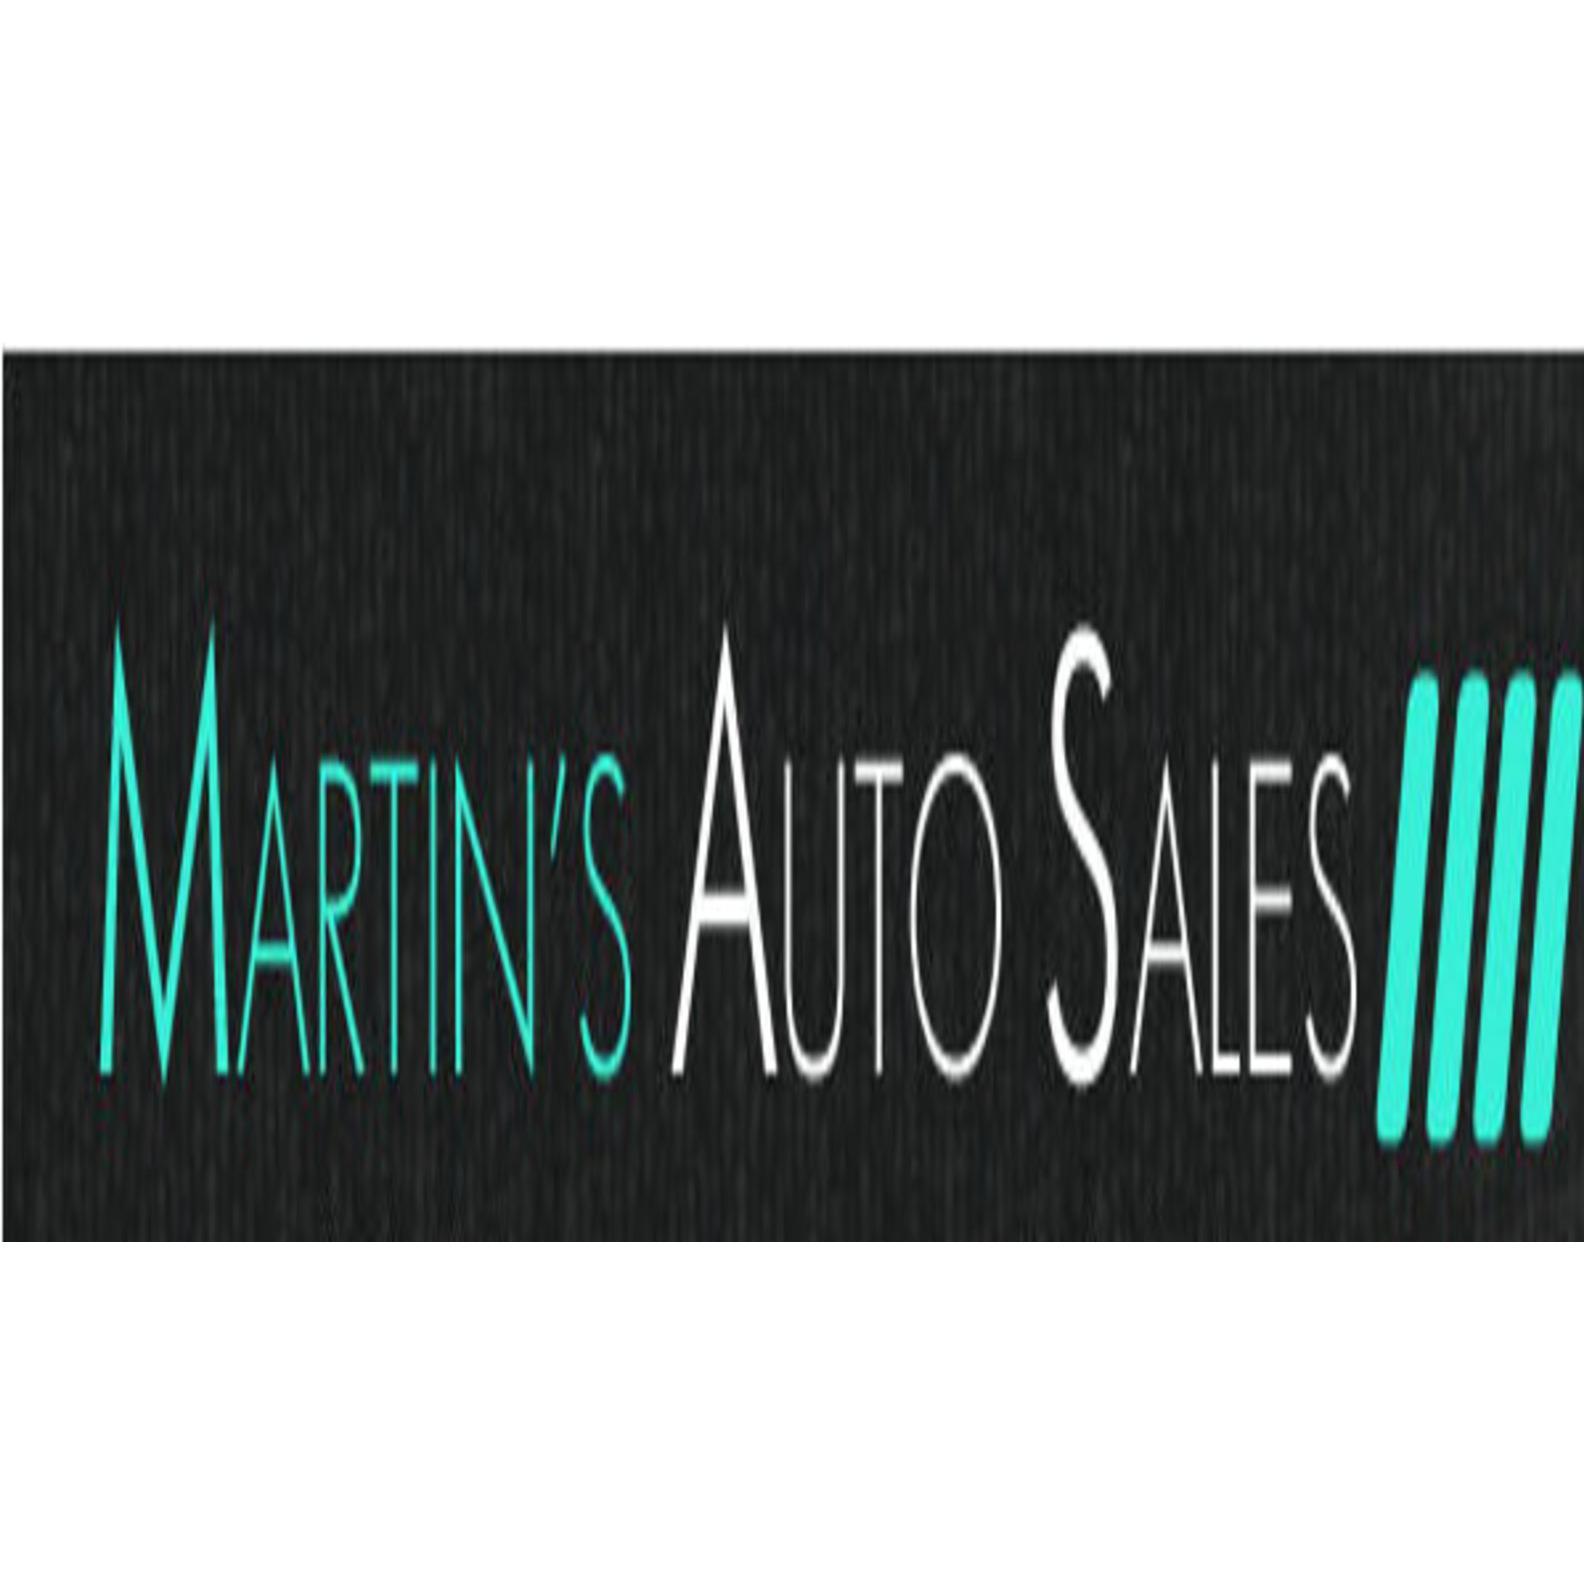 Martins Auto Sales In Lubbock Tx 79412